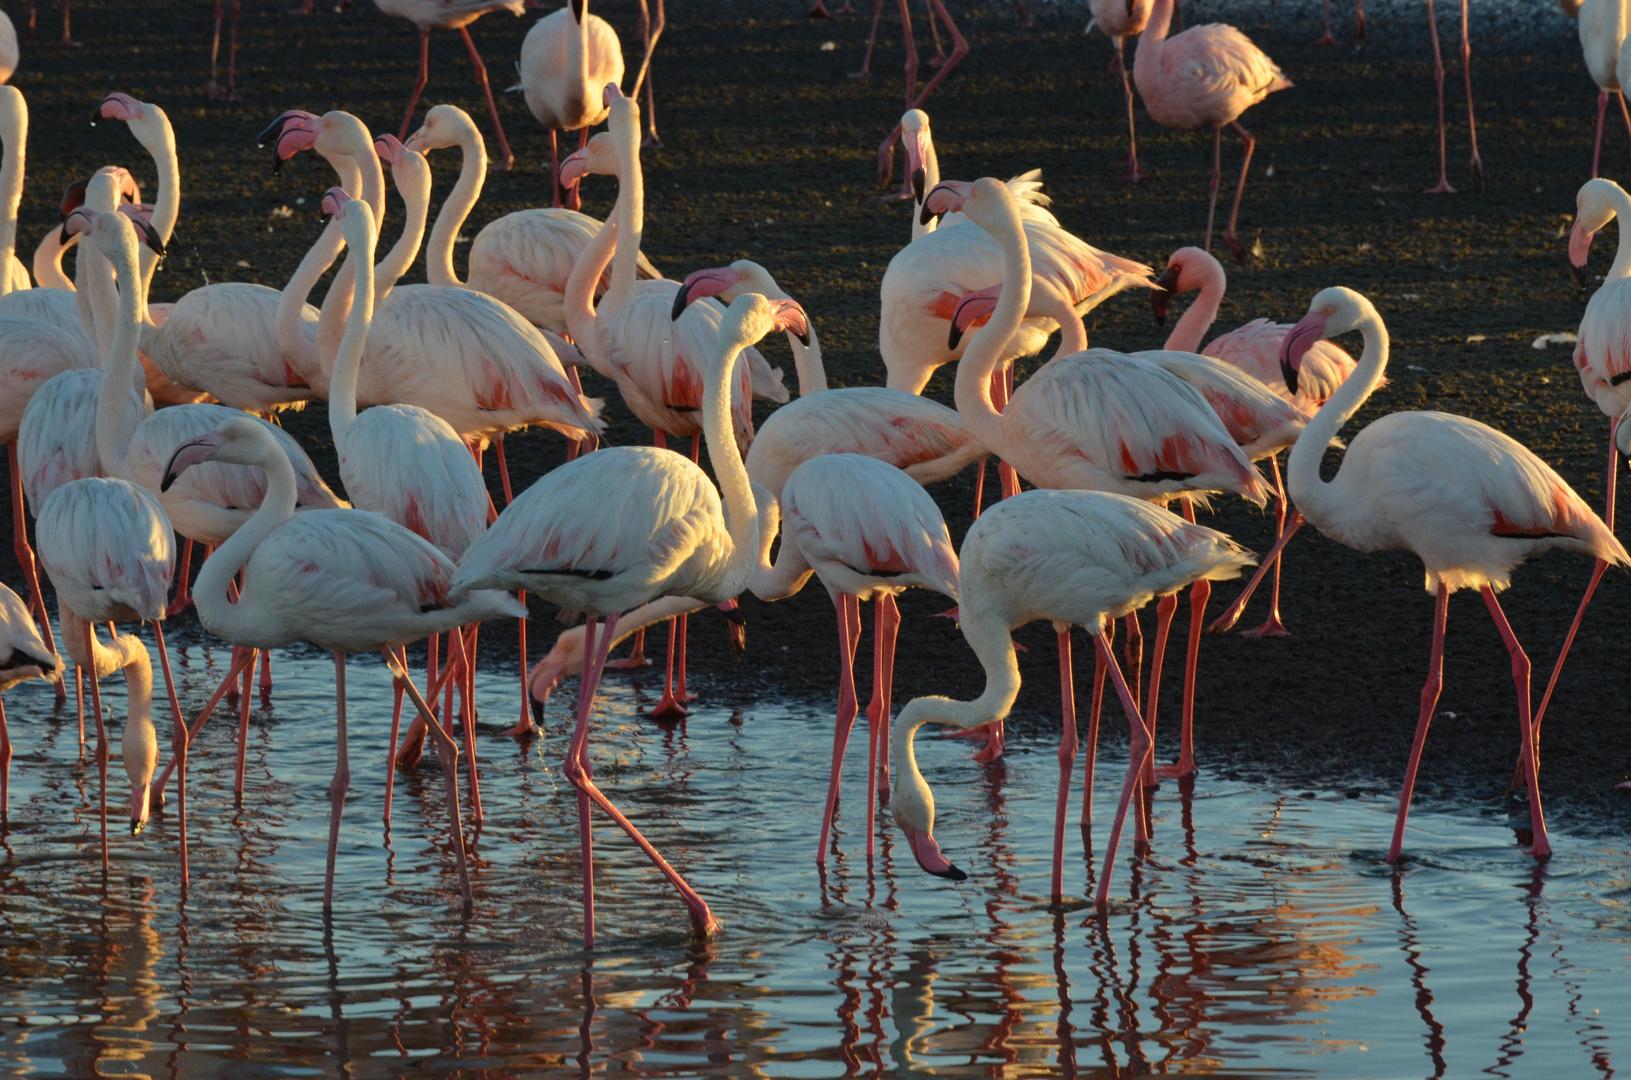 Flamingopoint